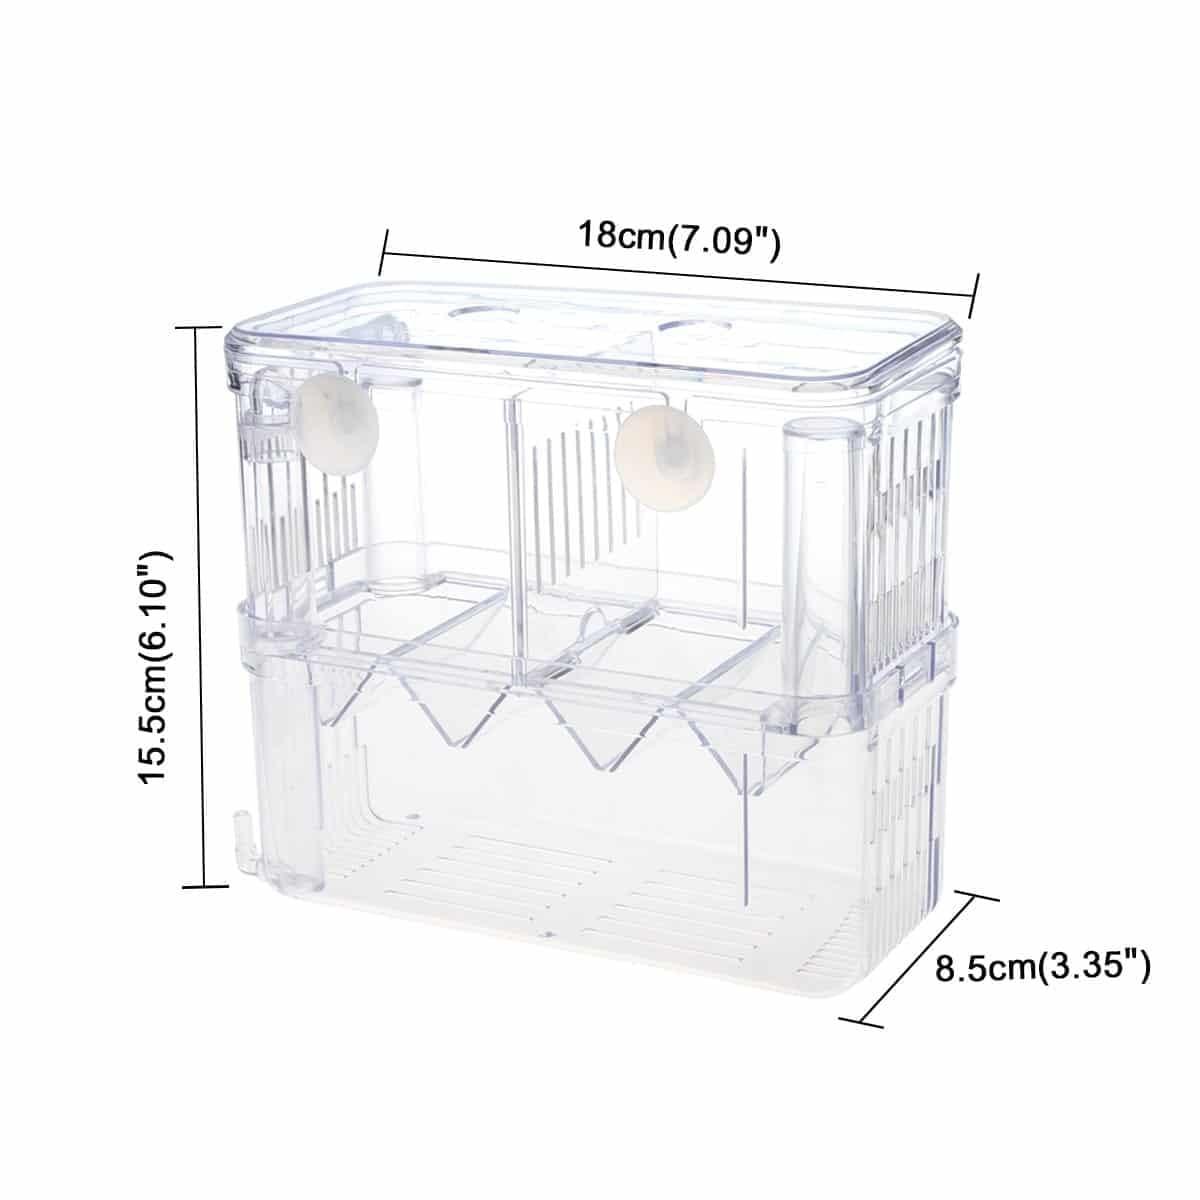 Fish Breeding Box/Shrimp Hatchery/Isolation Feeding Box for Aquarium